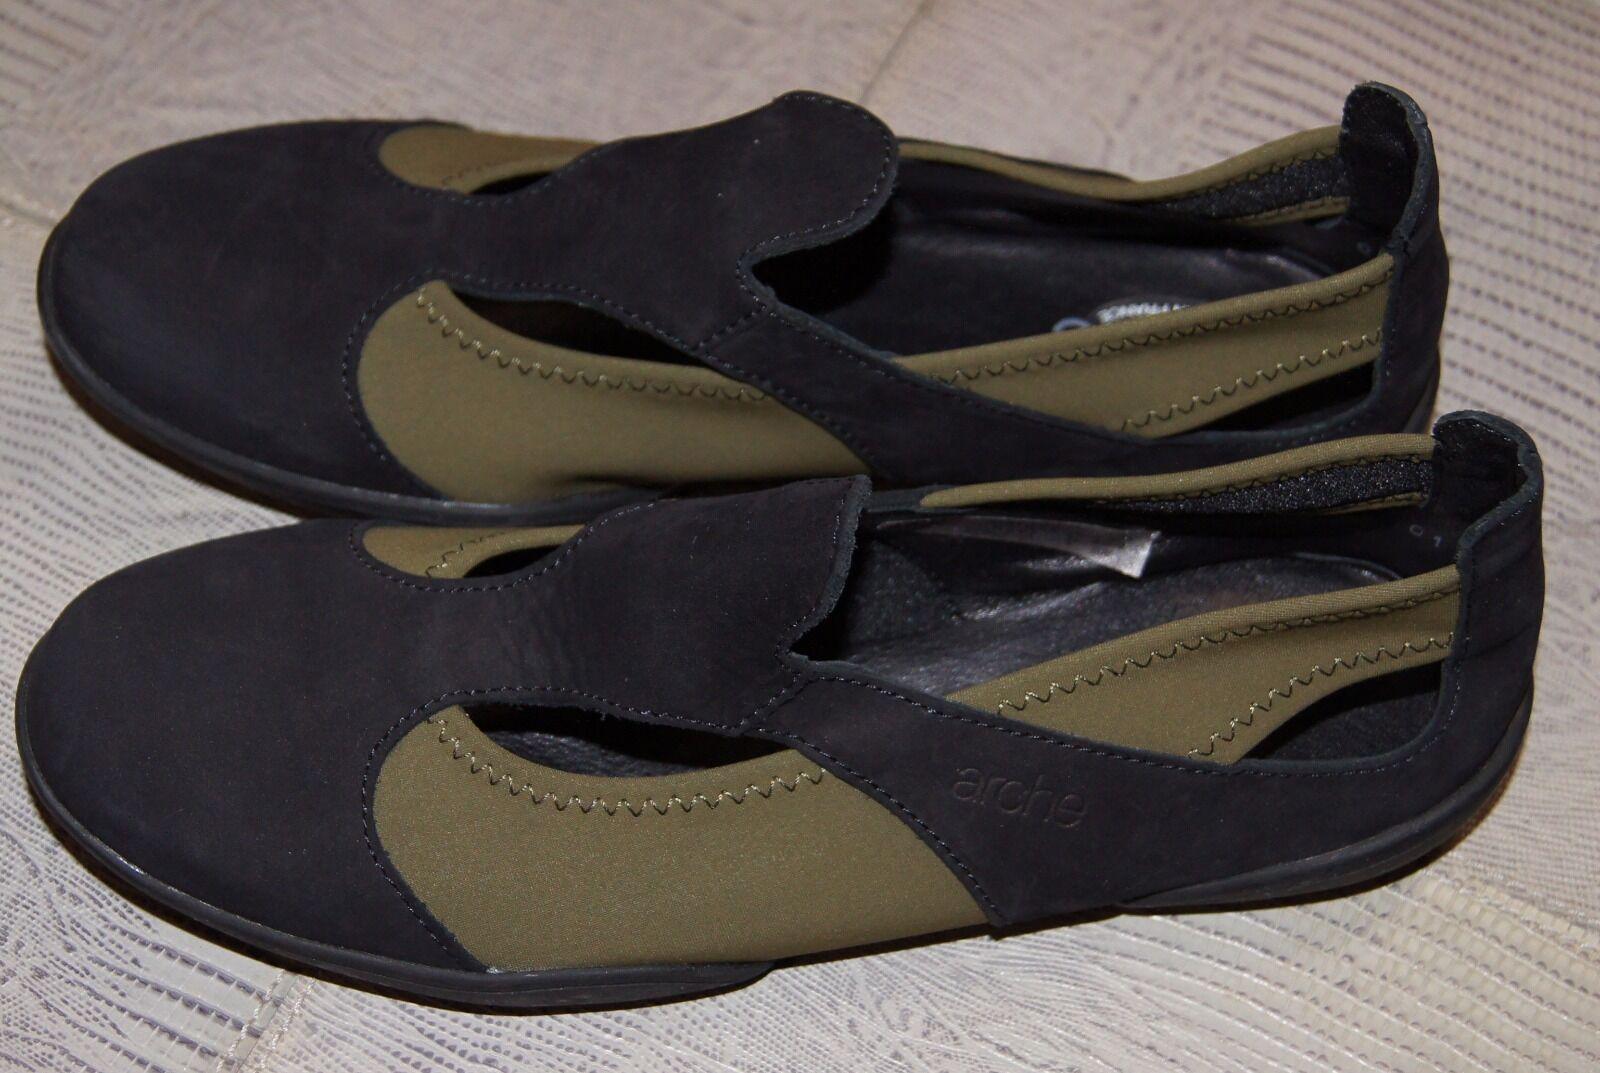 Arche Relax Flat shoes In Black Leather Khaki Stretch UK 2 EU 35